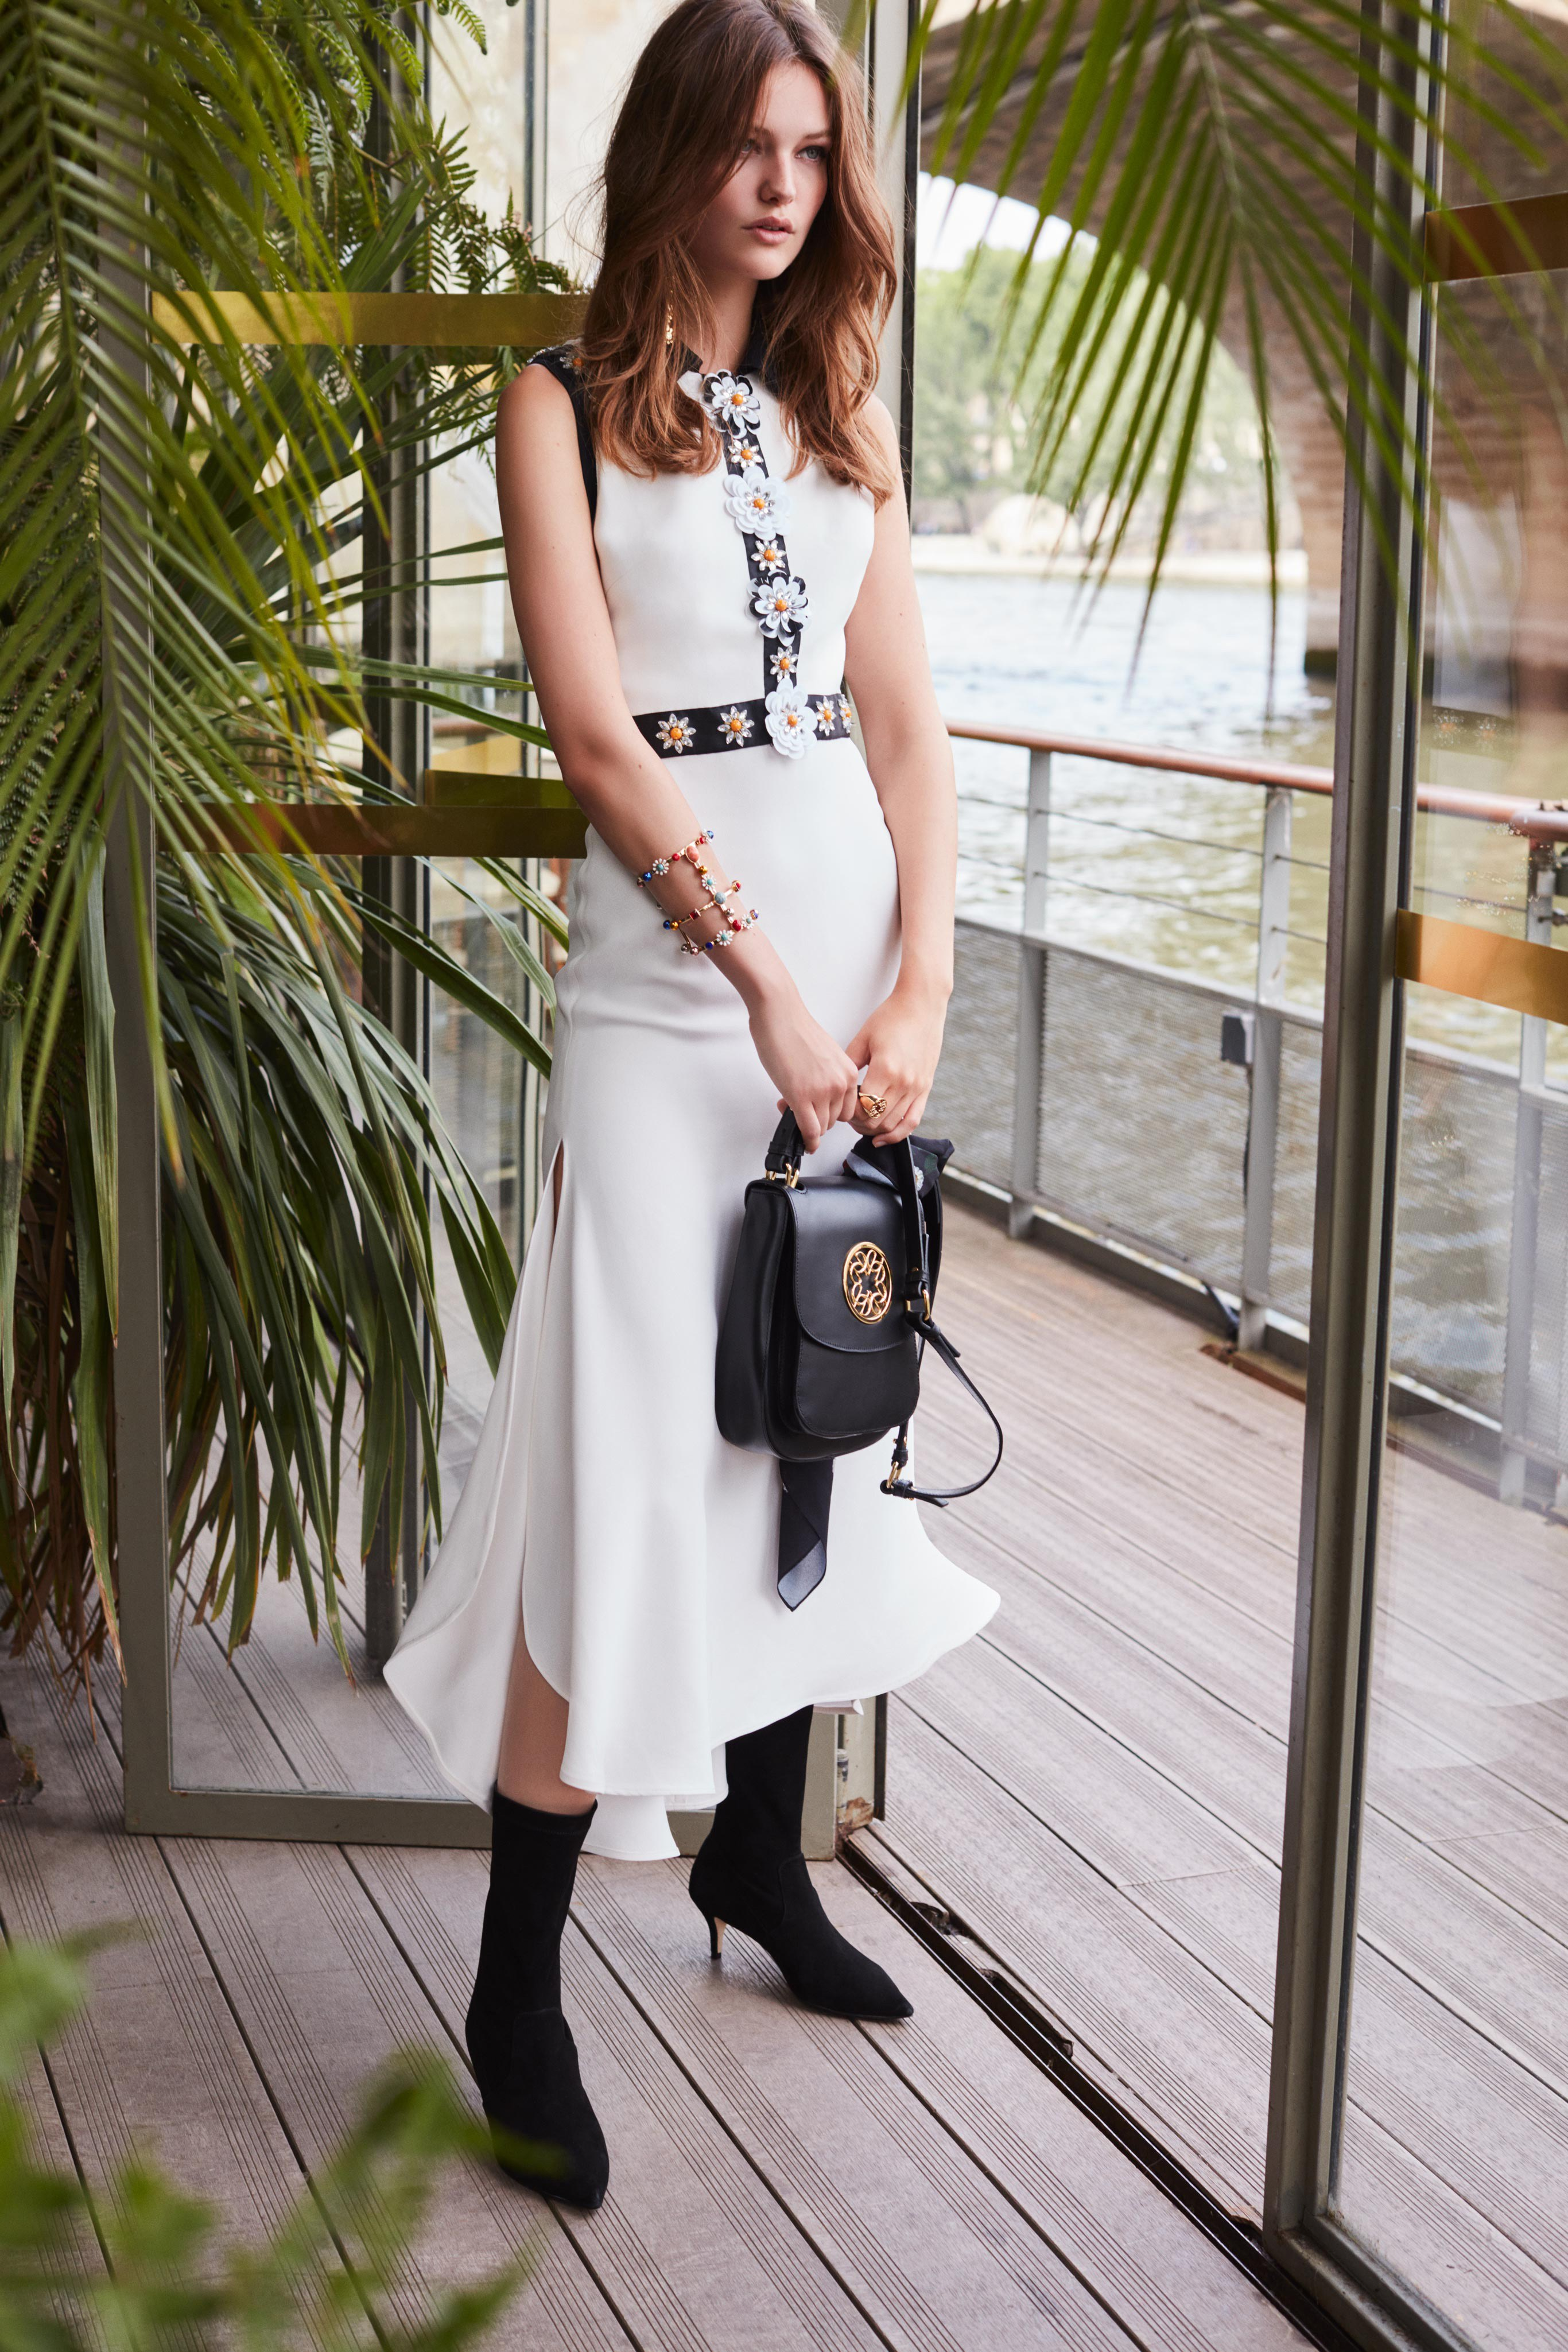 00005-Elie-Saab-Vogue-Resort-2019-pr